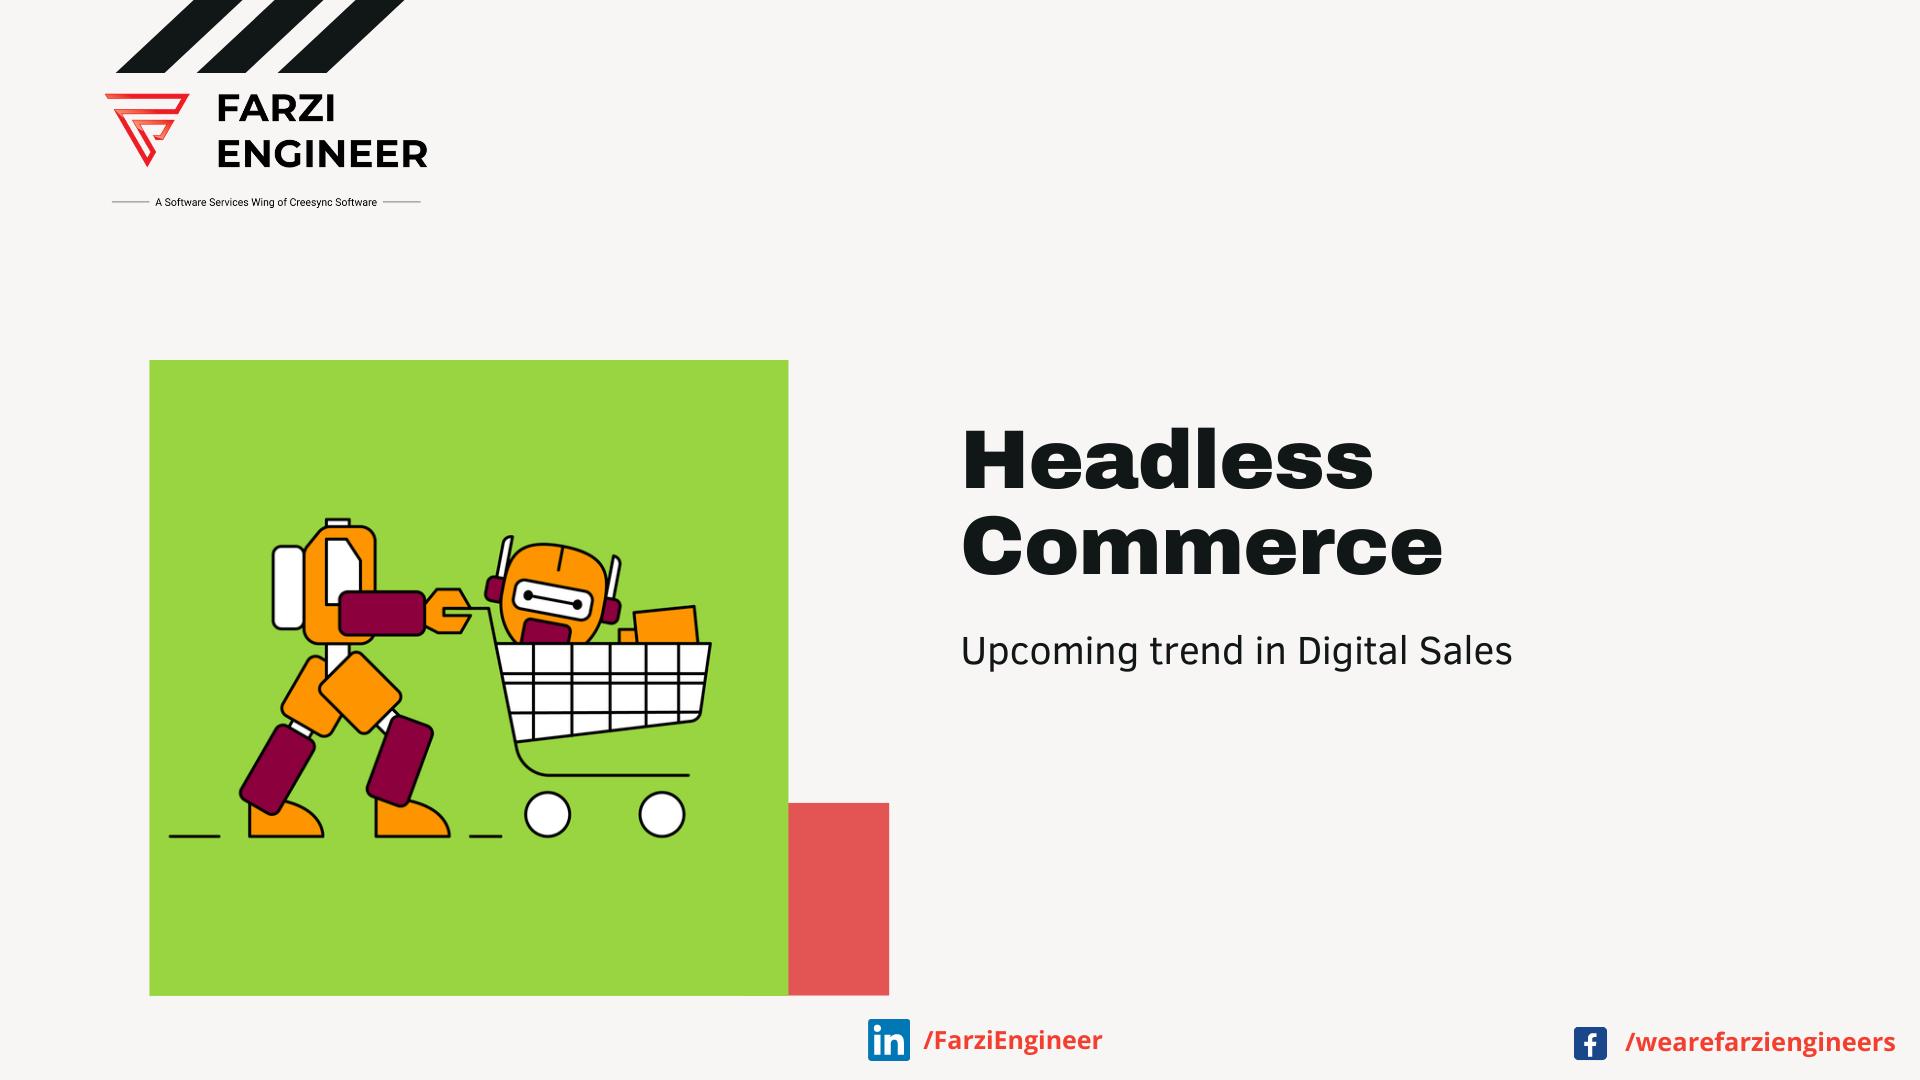 Headless Commerce: Upcoming trend in Digital Sales